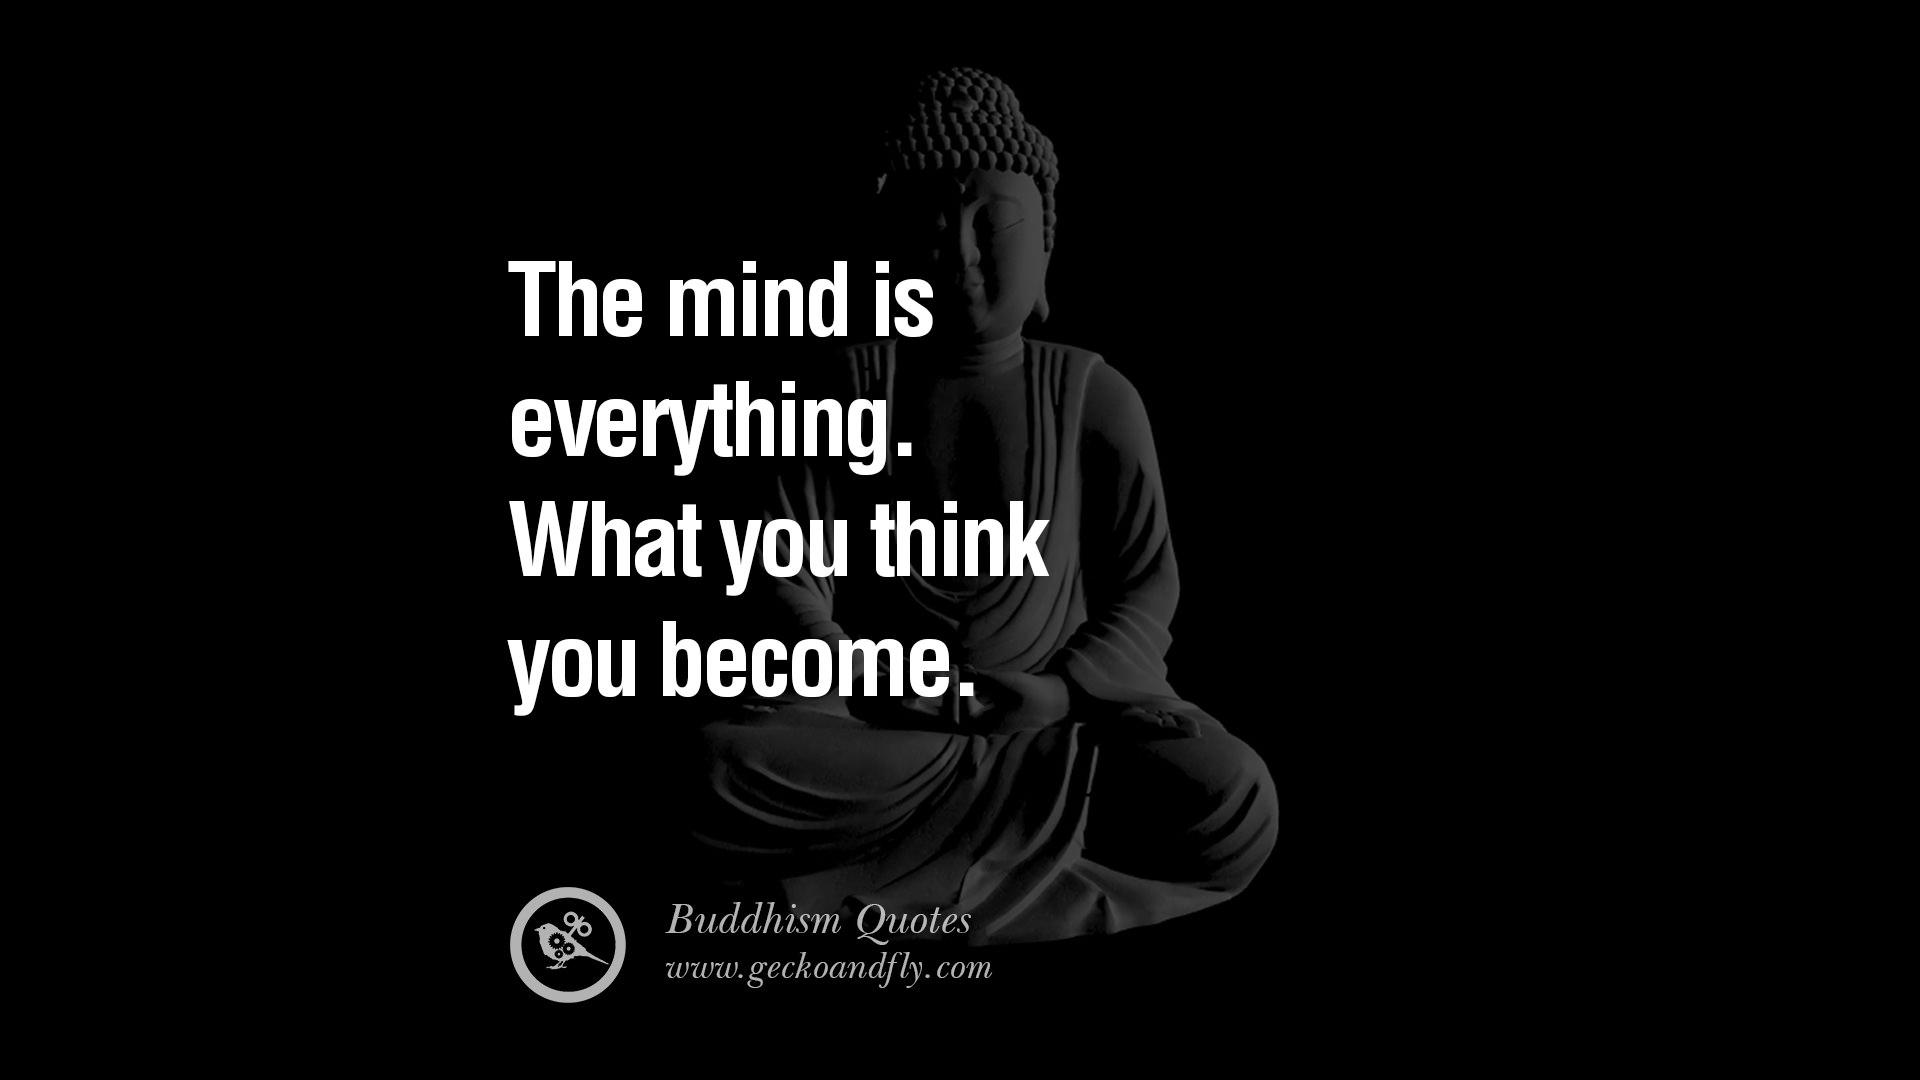 13 Gautama Buddha Quotes On Anger Management And Salvation